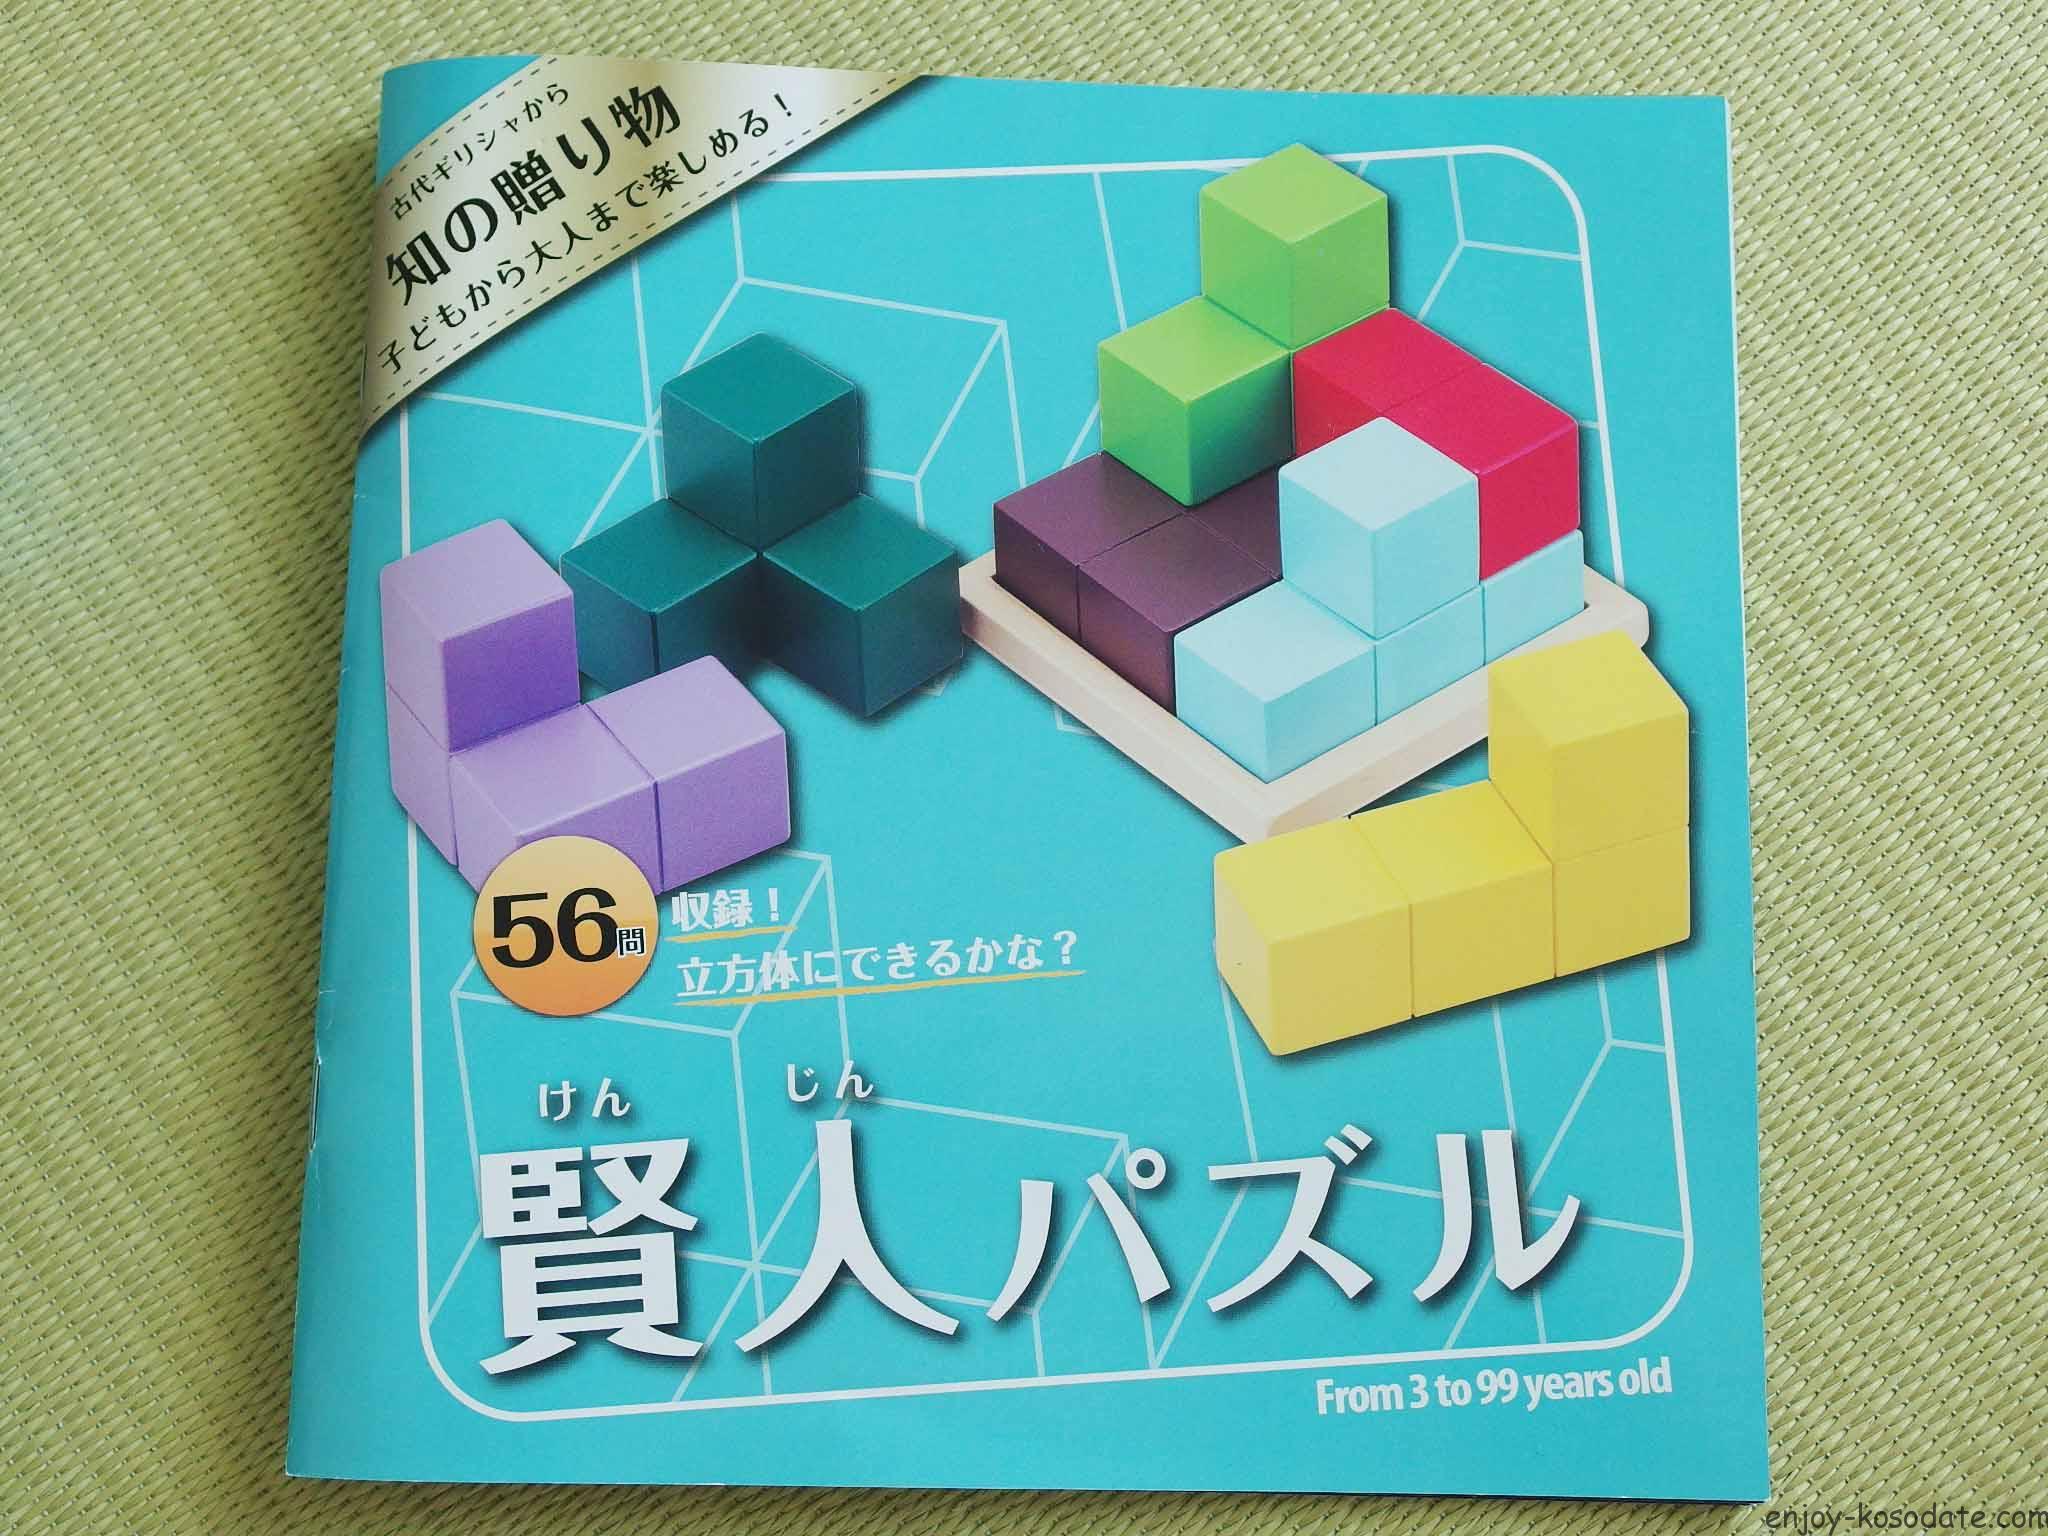 IMGP0506 - コピー